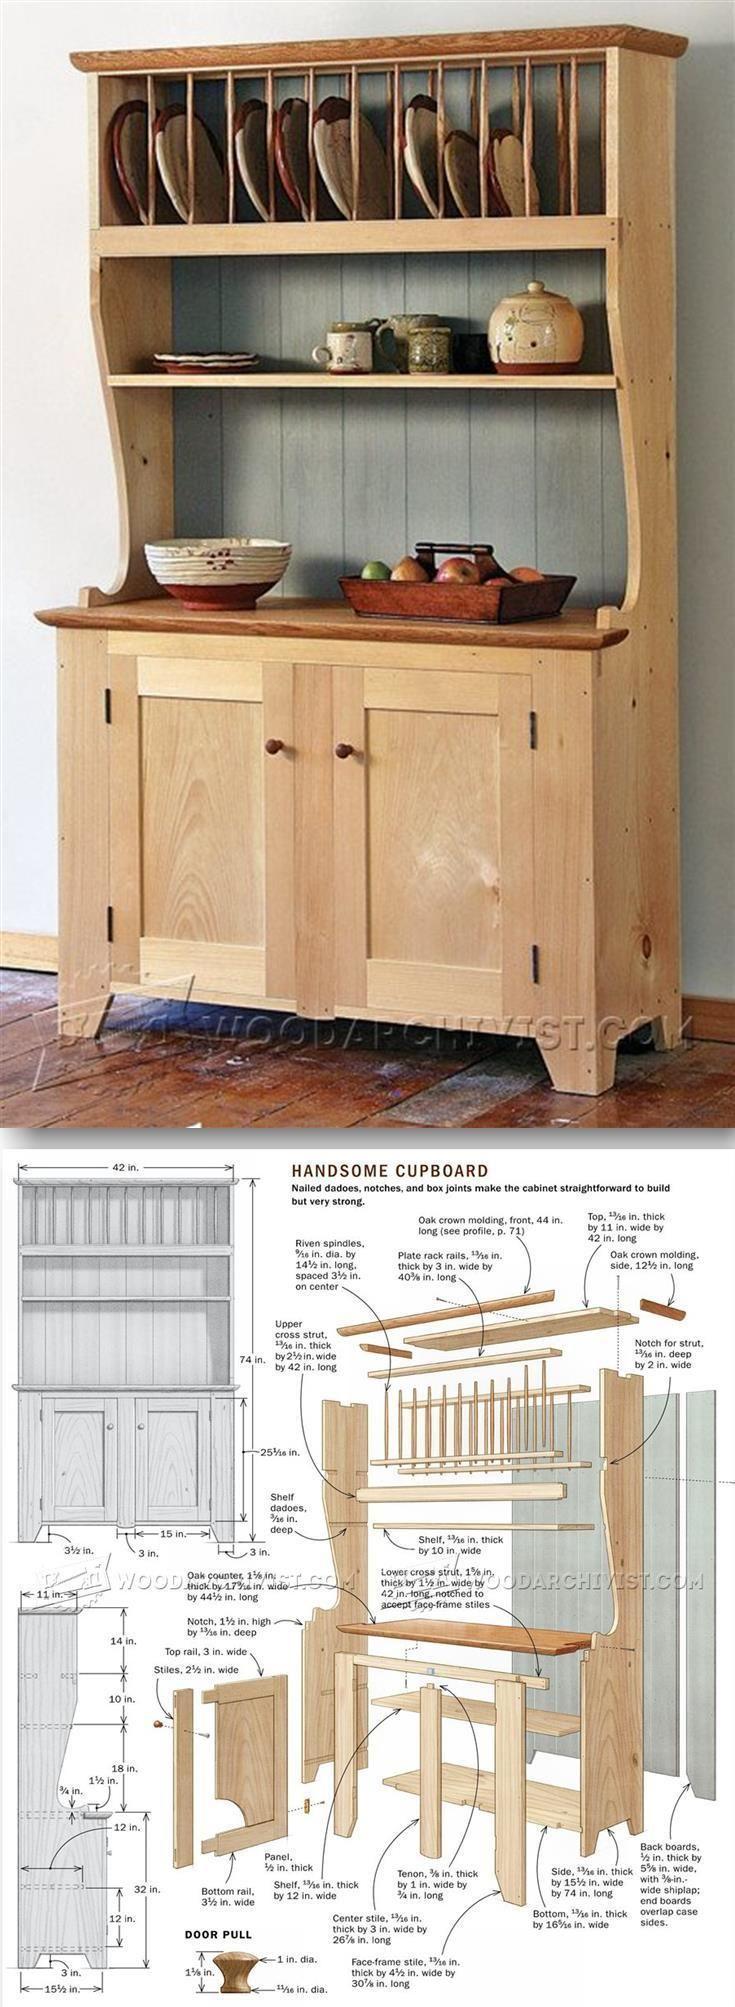 Mejores 8030 im genes de woodworking projects en pinterest for Planos de carpinteria de madera